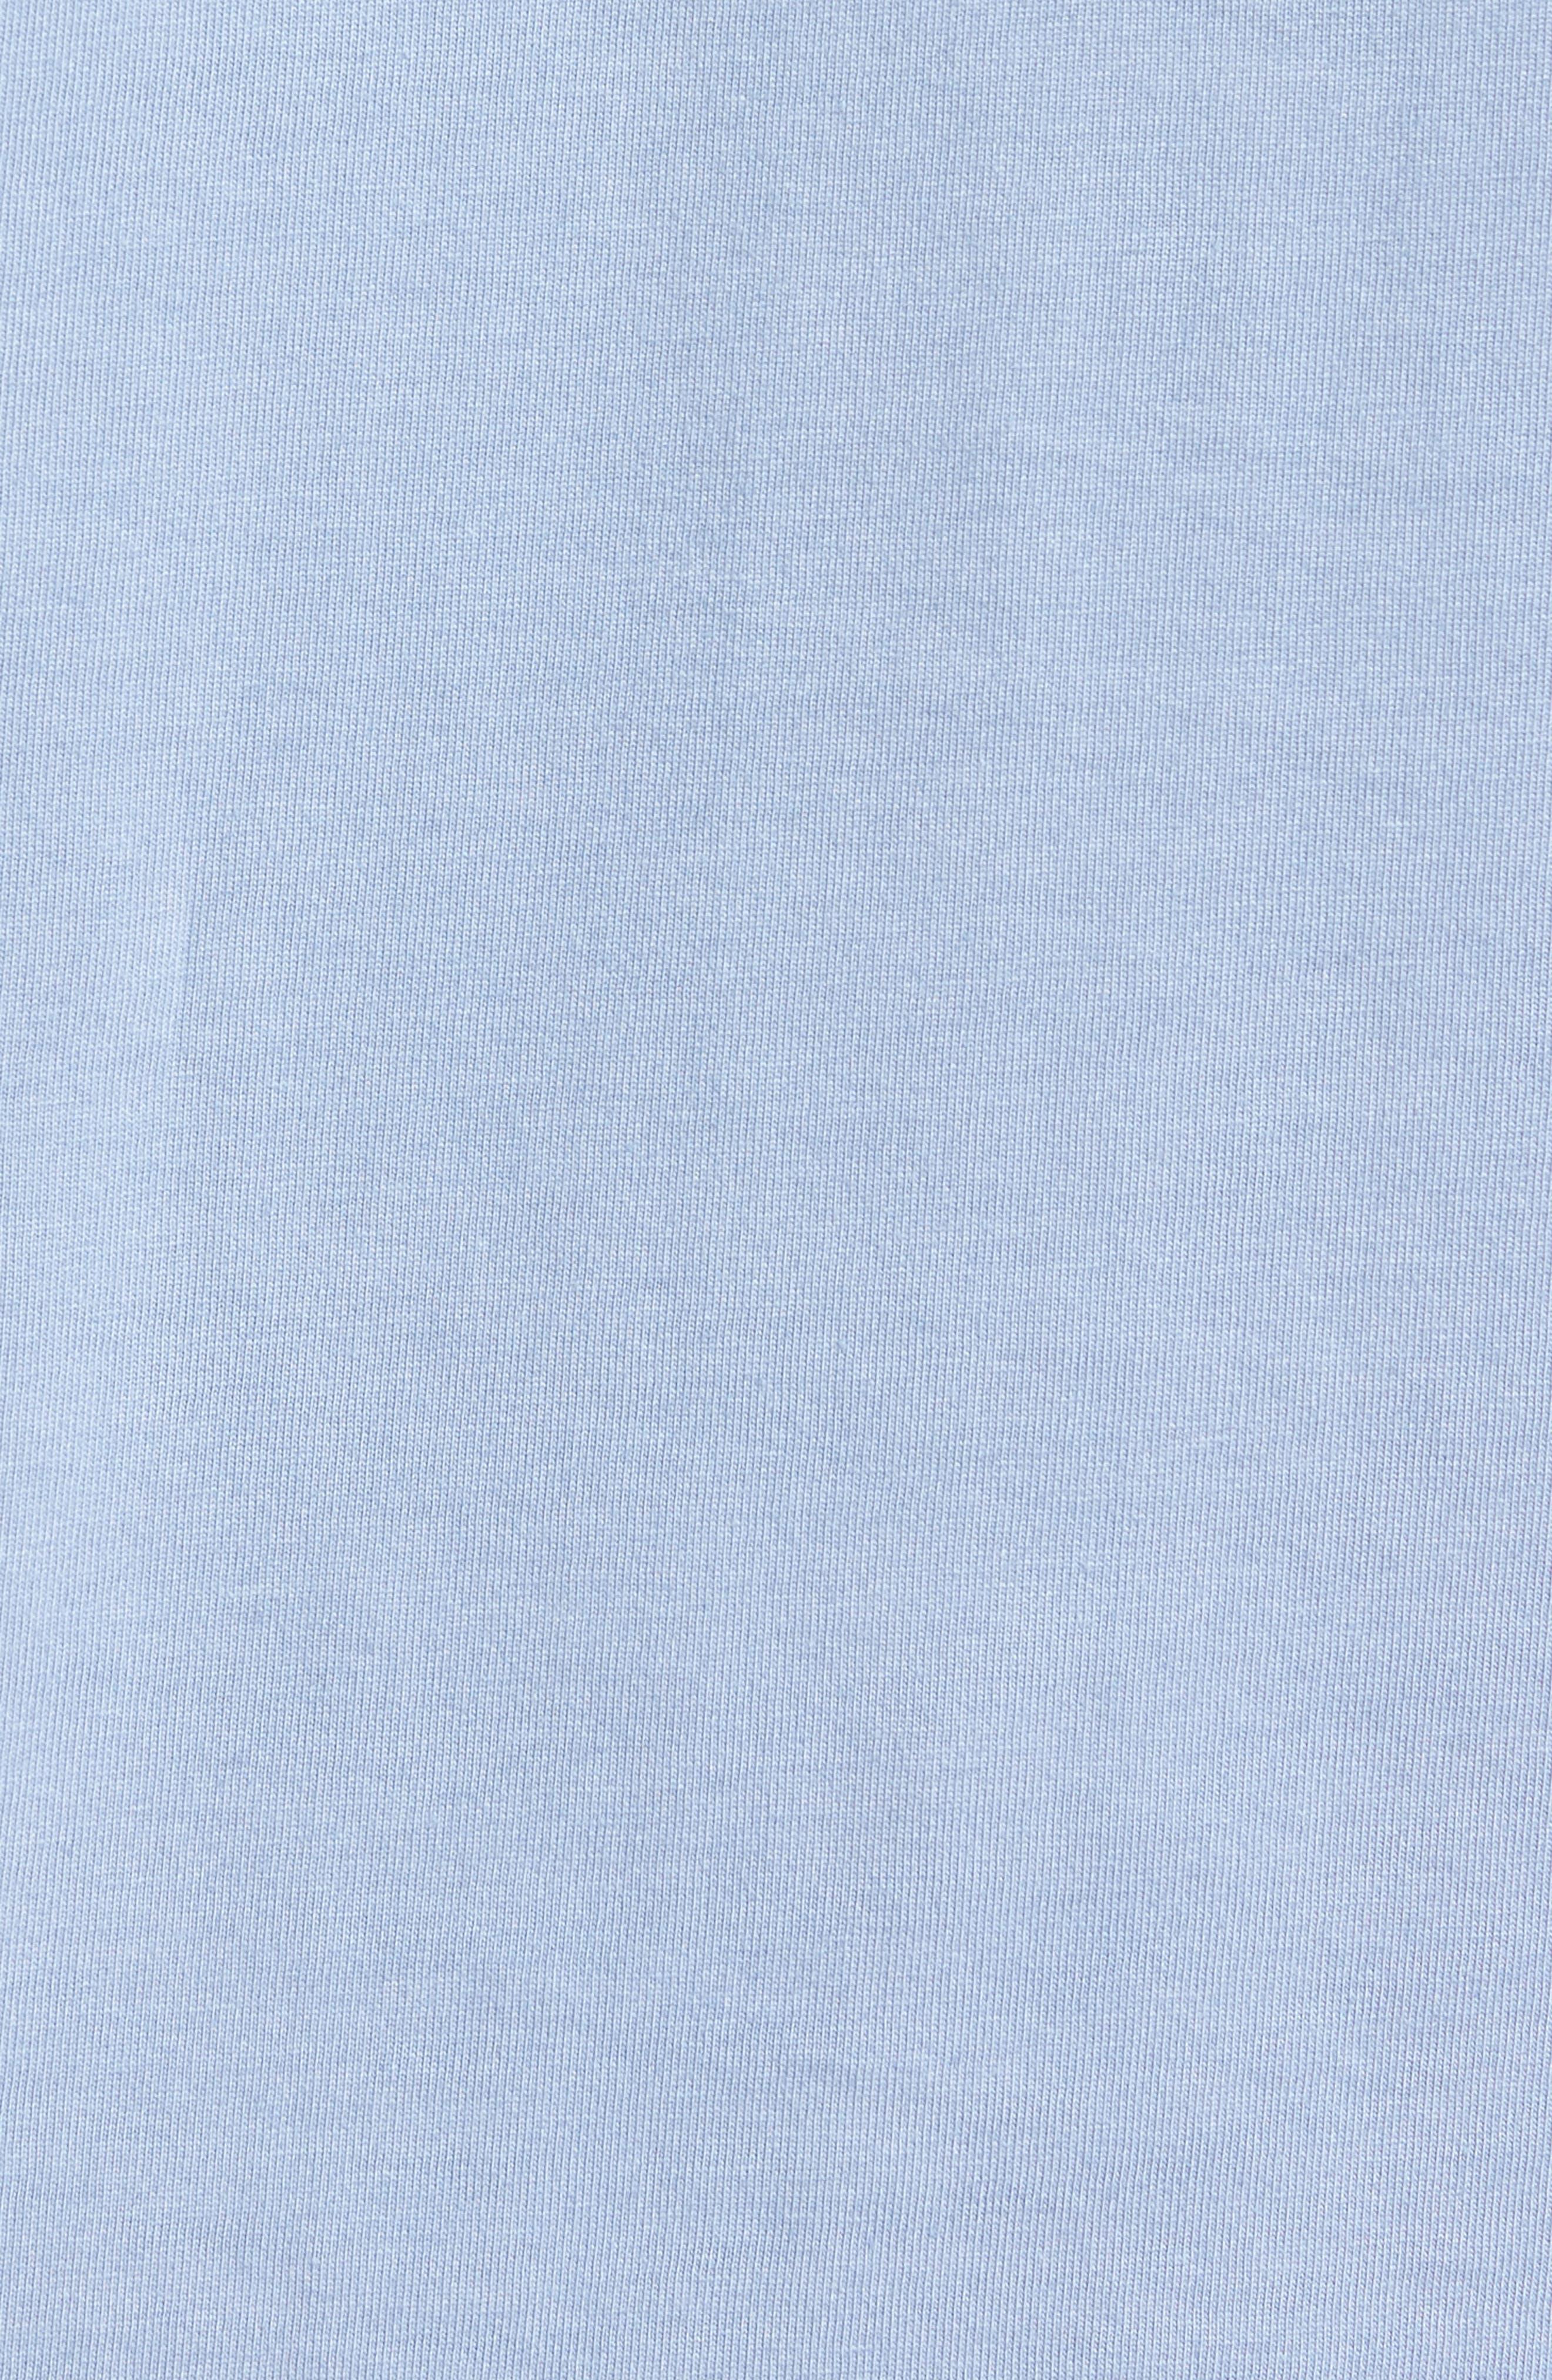 Sportfisher Regular Fit Pocket Tee,                             Alternate thumbnail 5, color,                             020